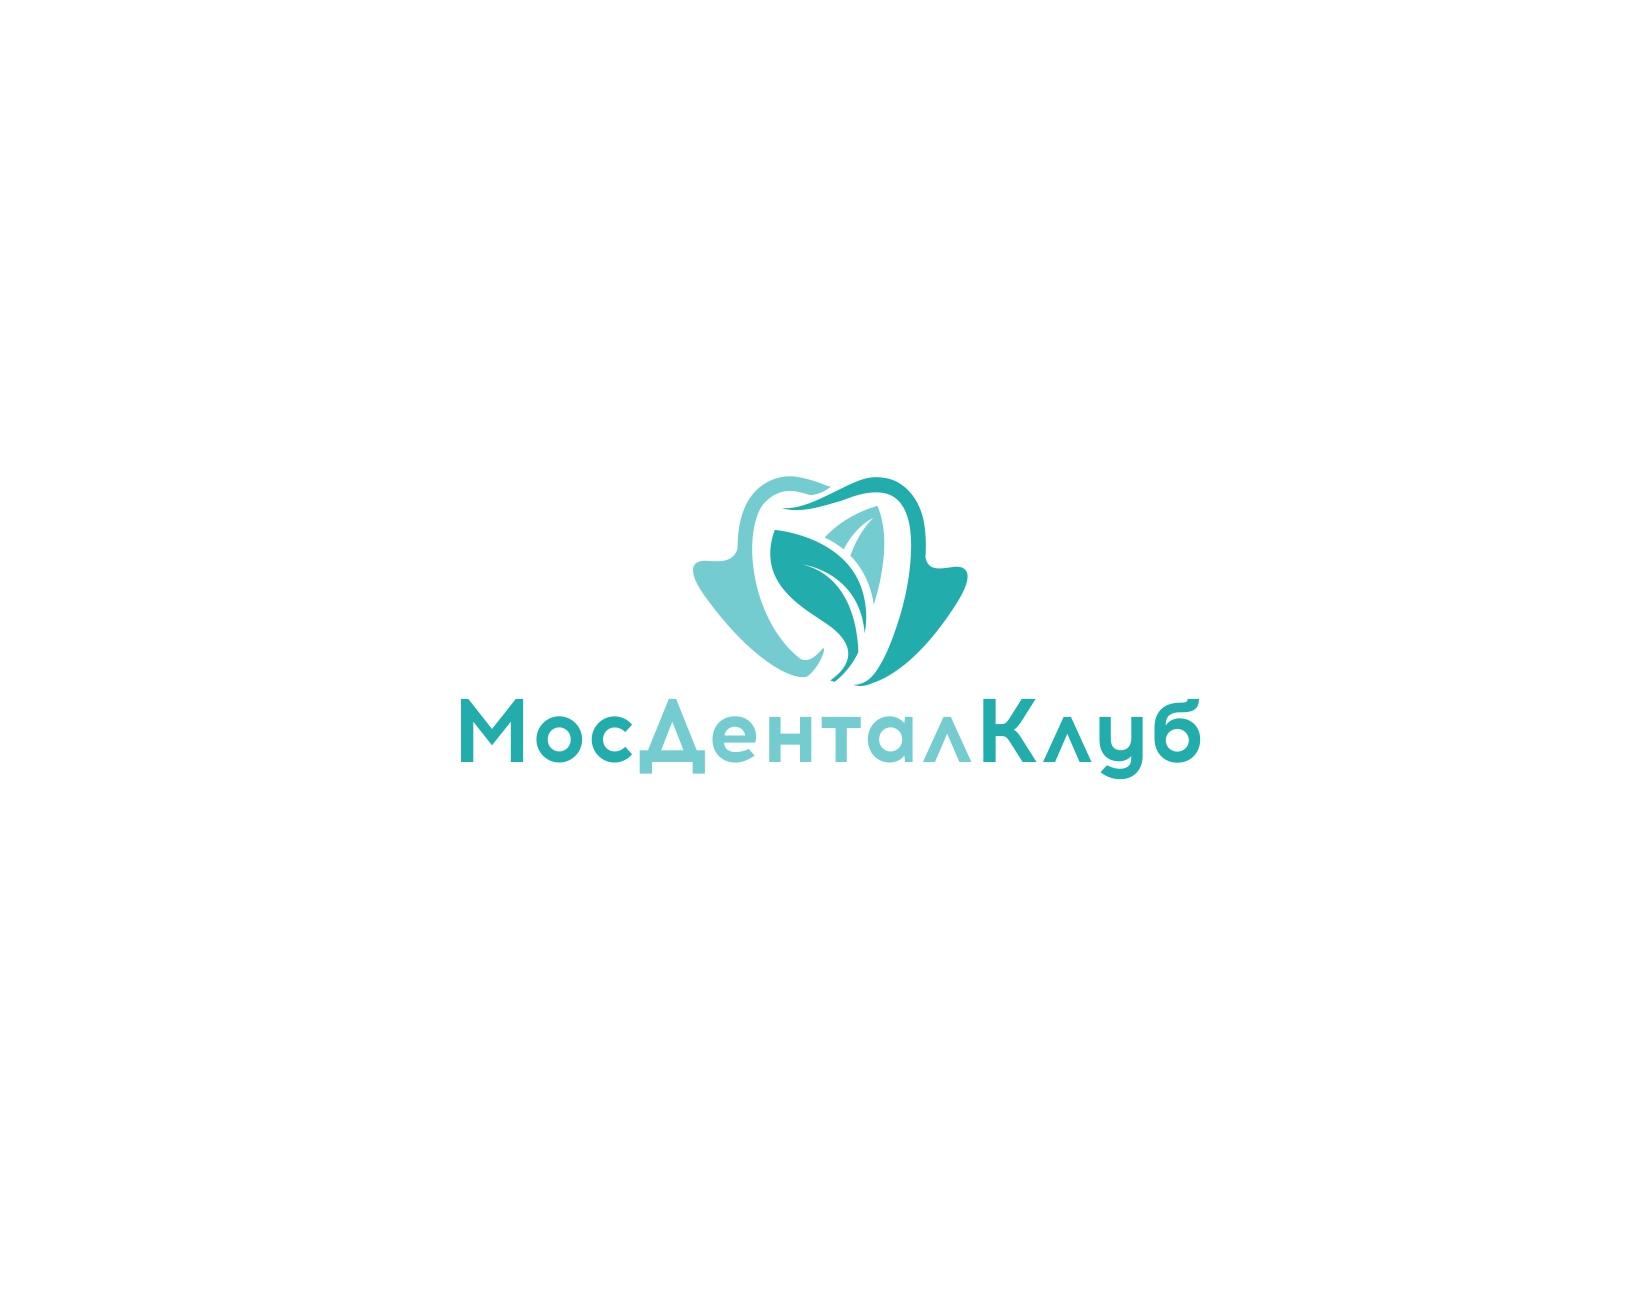 Разработка логотипа стоматологического медицинского центра фото f_8445e457c89326d6.jpg